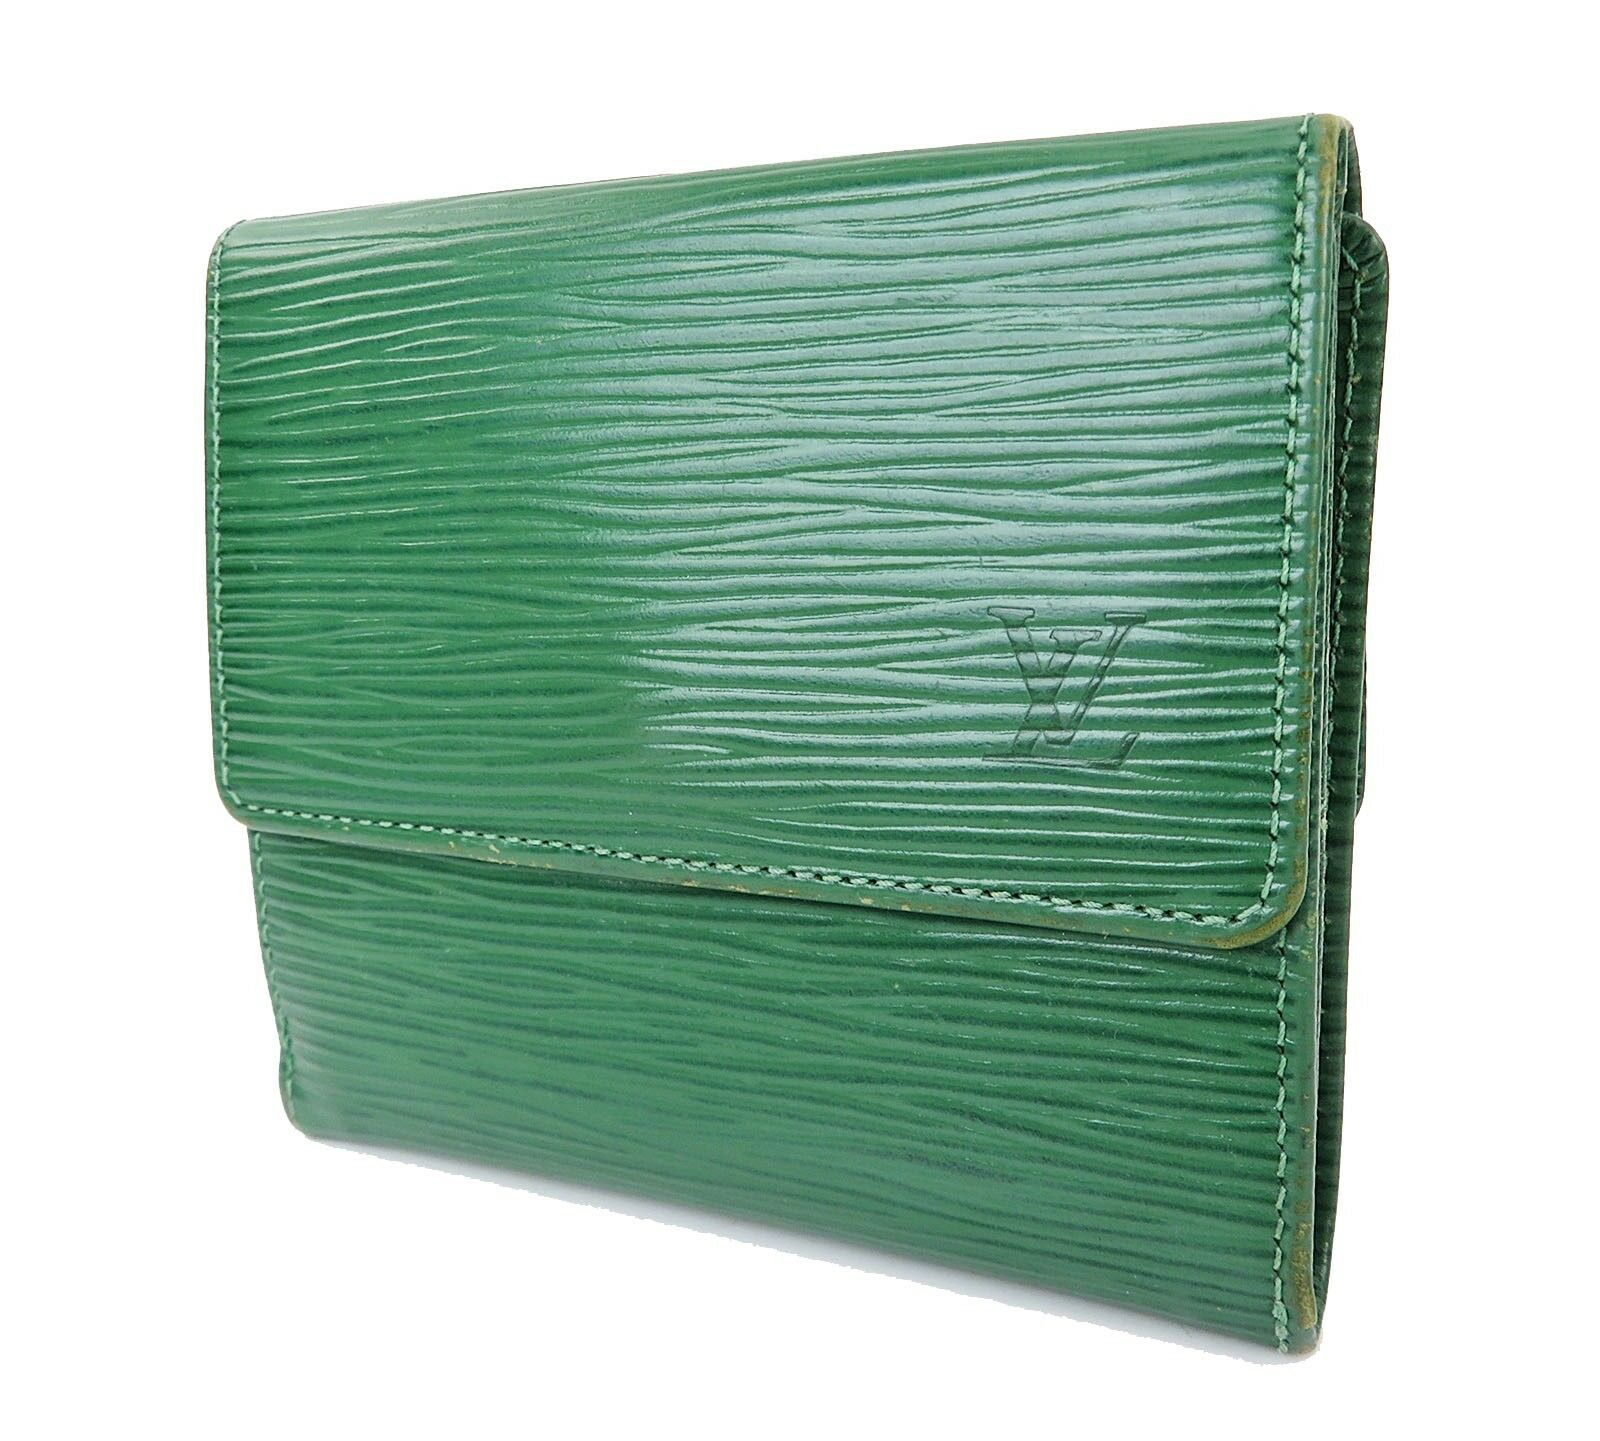 BAGLIONI ITALIA MEN/'S GENUINE LIZARD FRONT POCKET CARD CASE WALLET COPPER